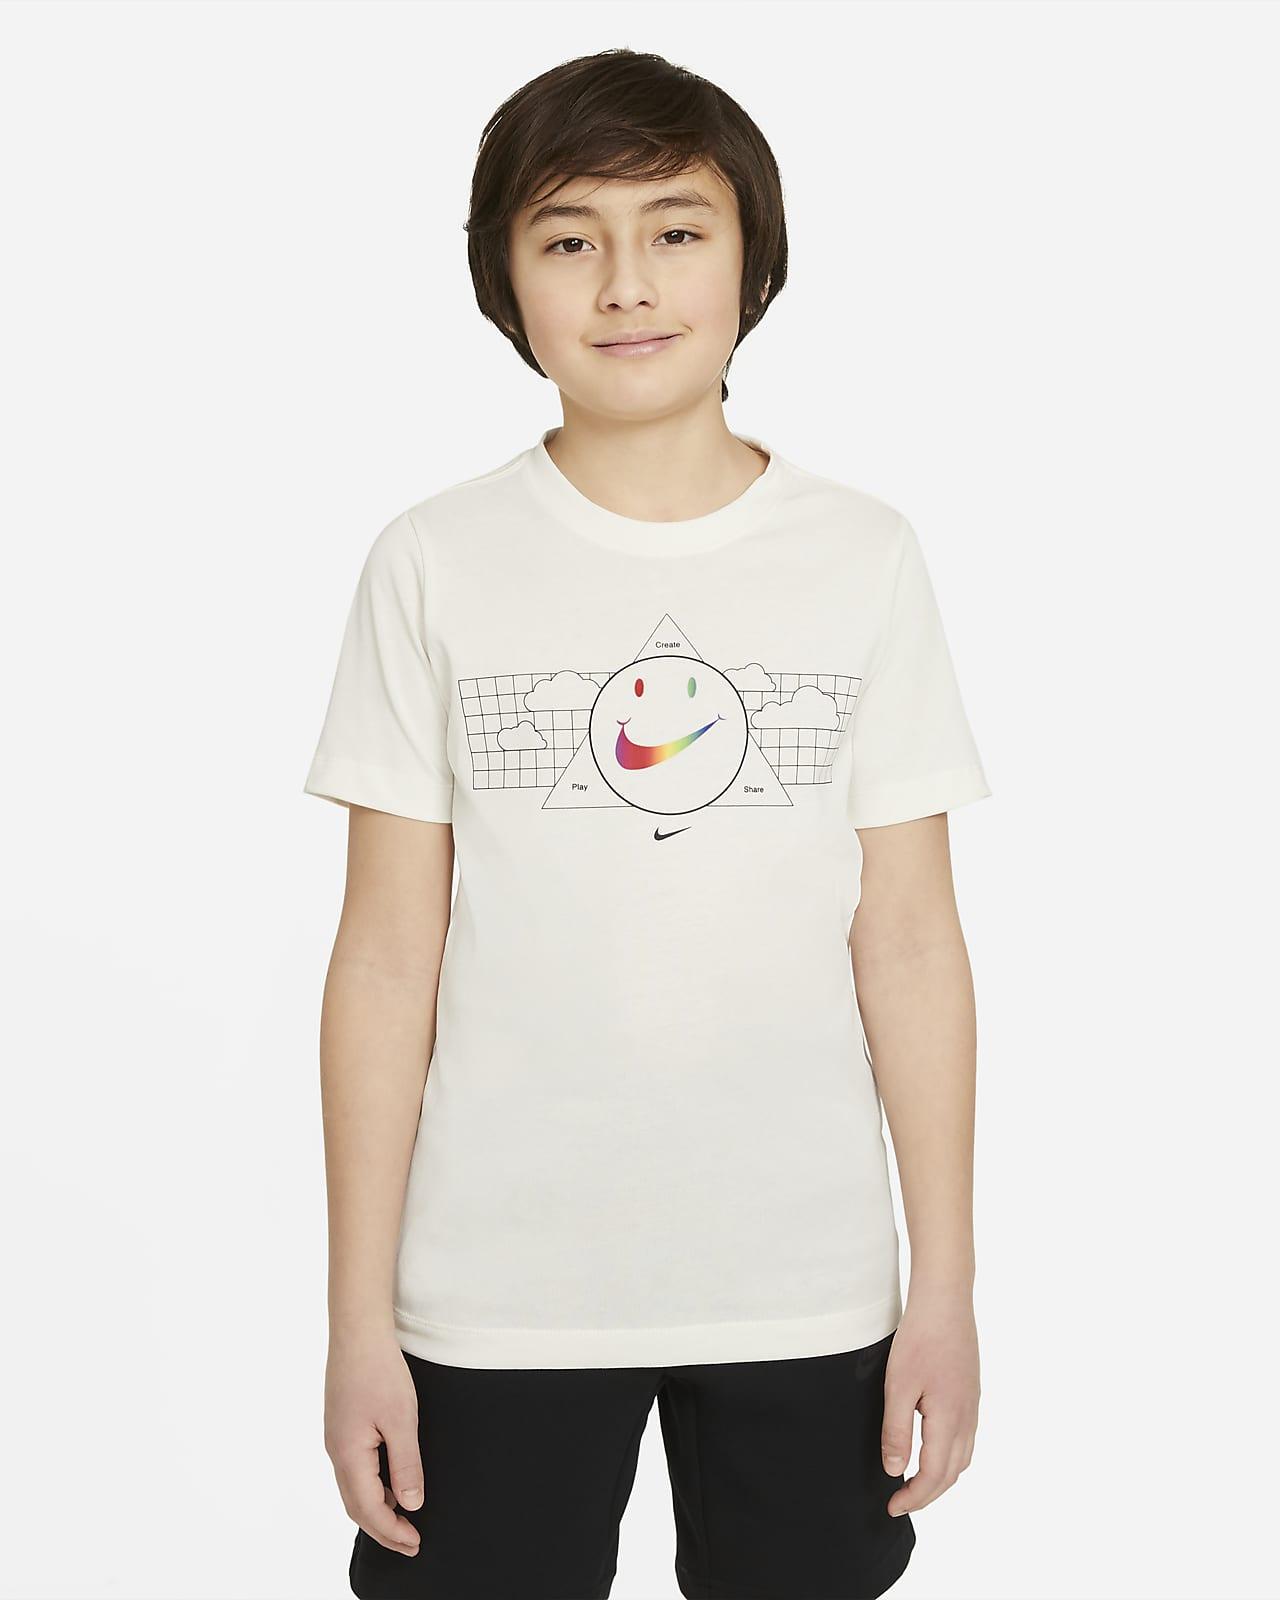 T-shirt Nike Sportswear - Ragazzi